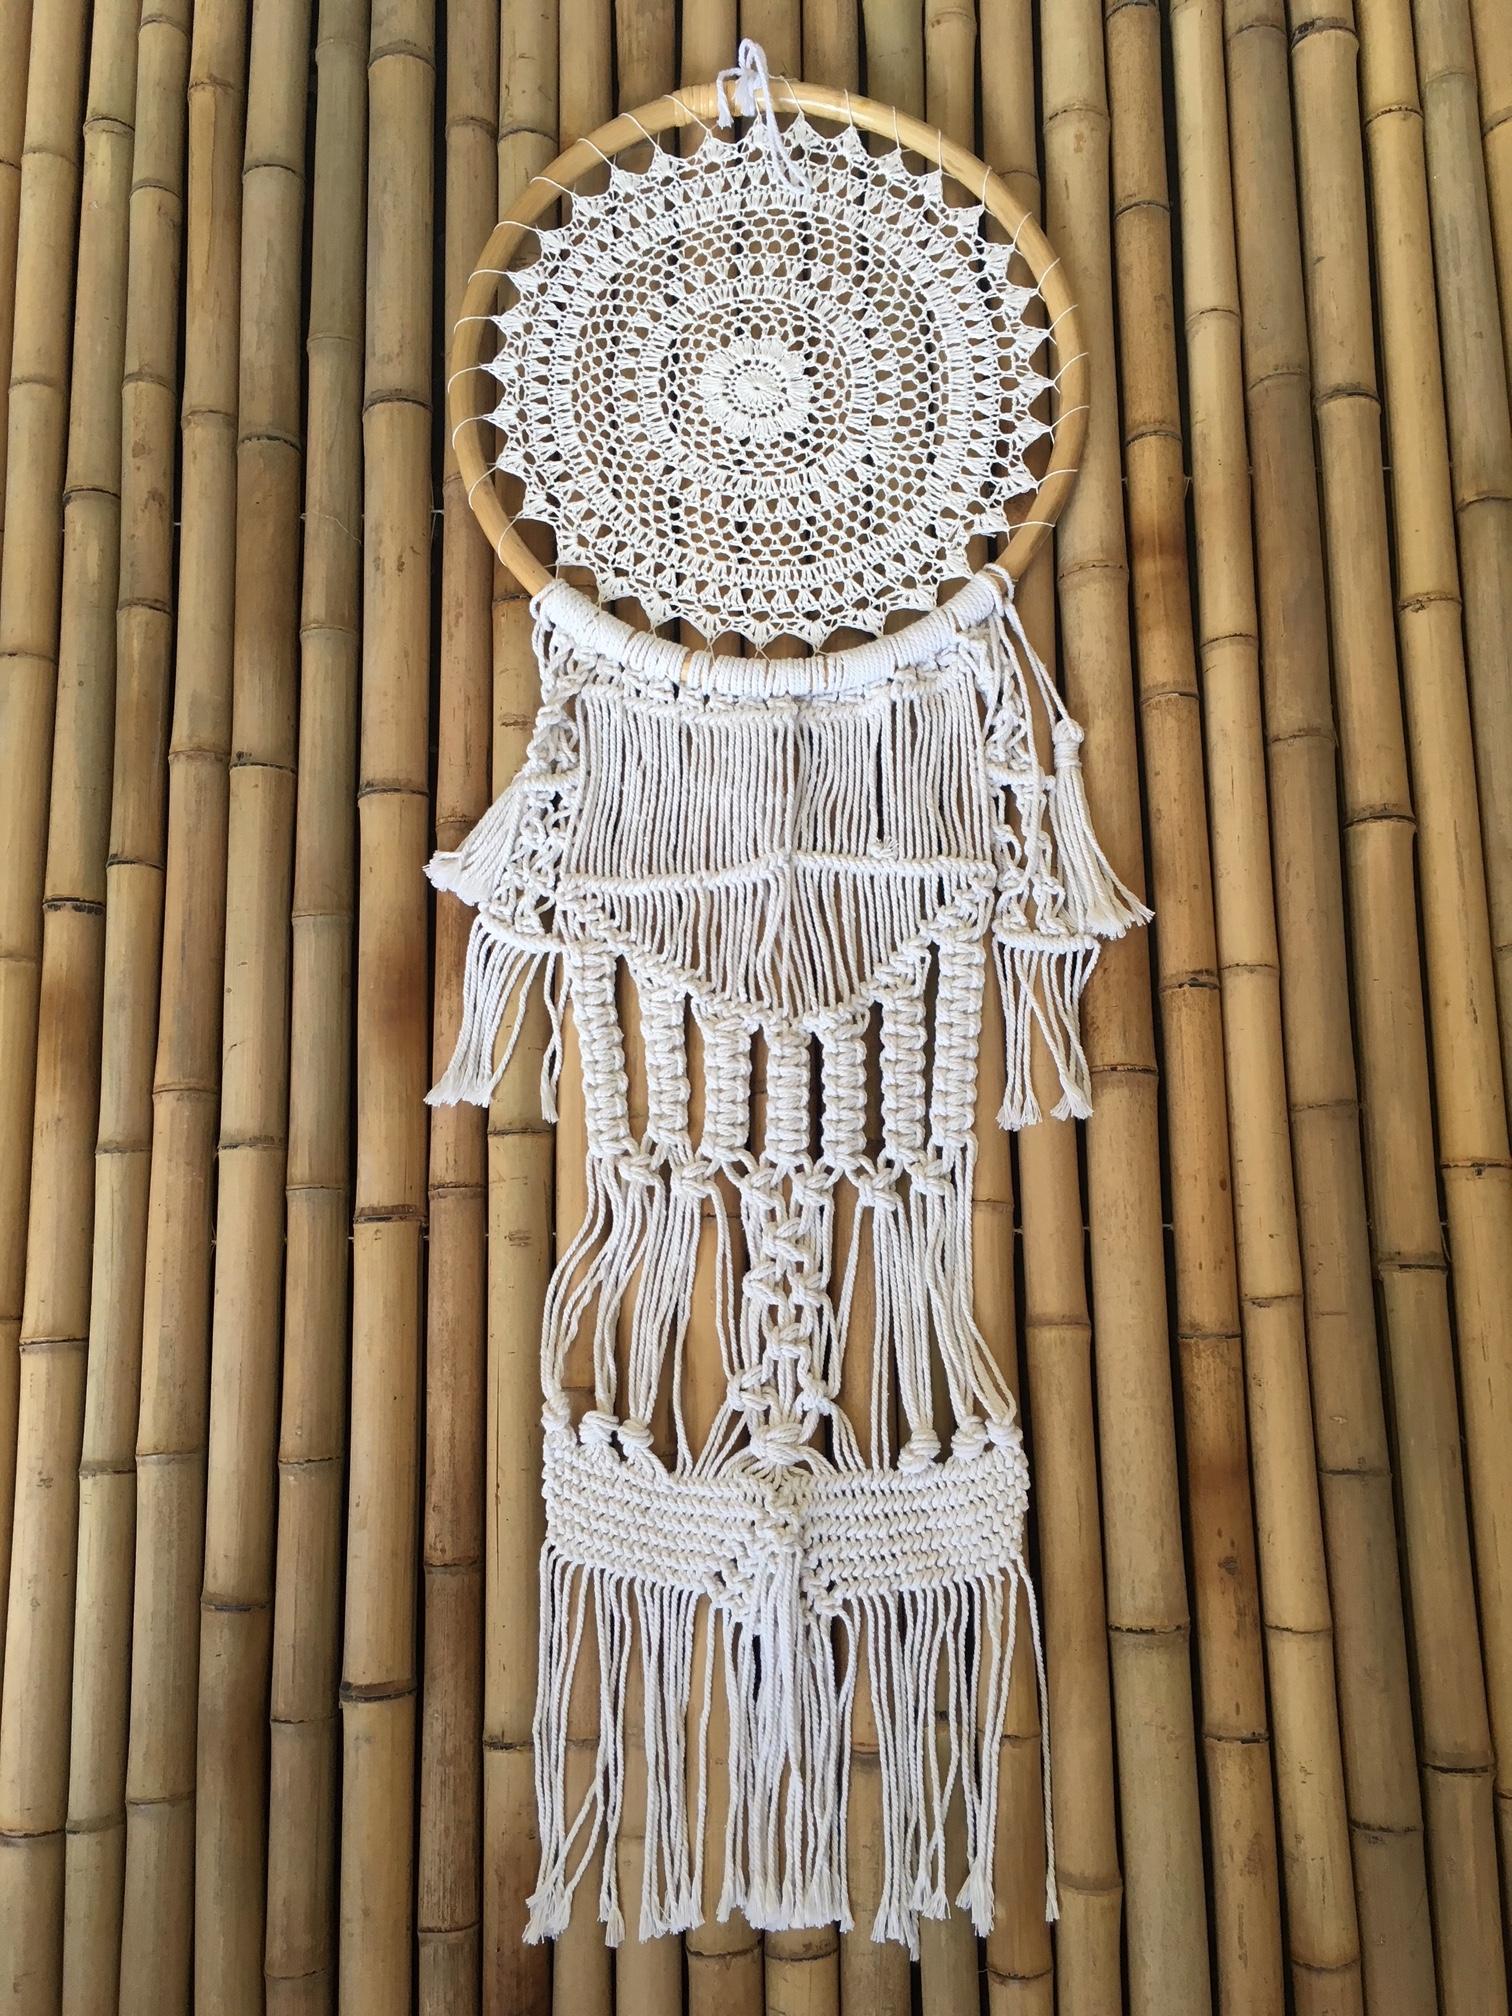 Boho Crochet Dreamcatcher Cane With Macrame Knotted Fringe